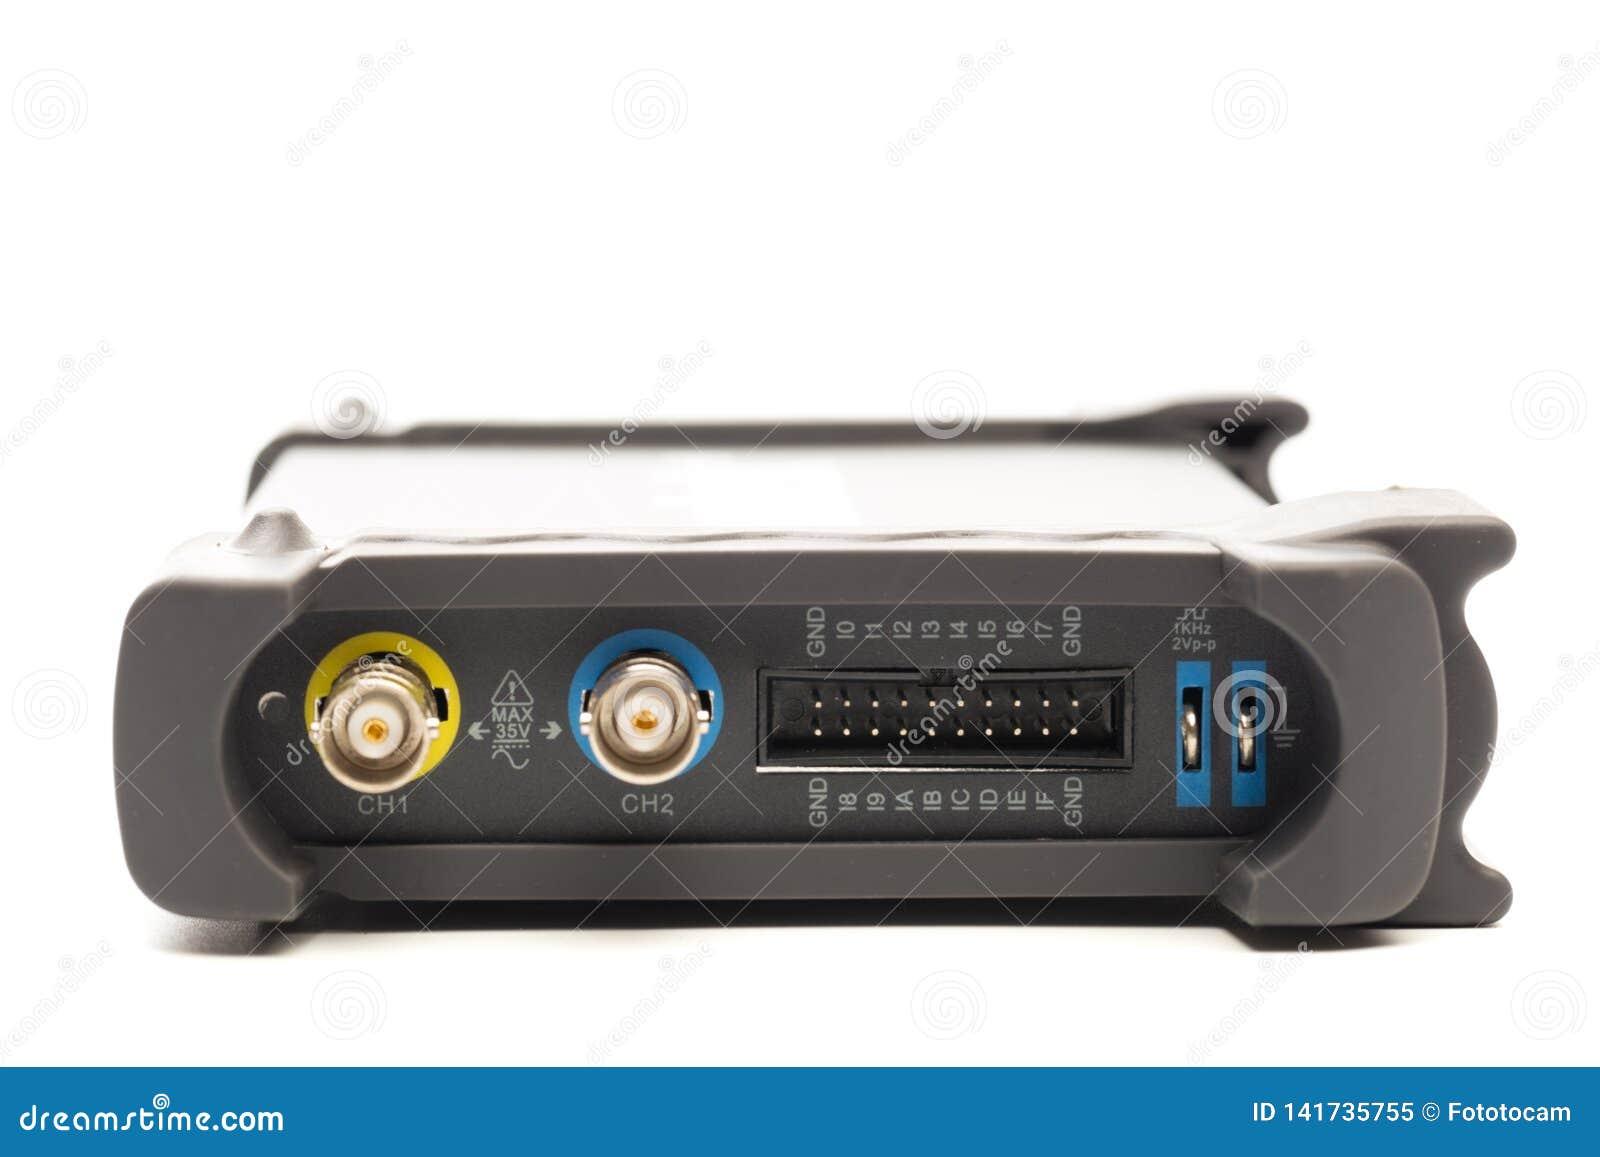 BNC input connector of digital signal oscilloscope